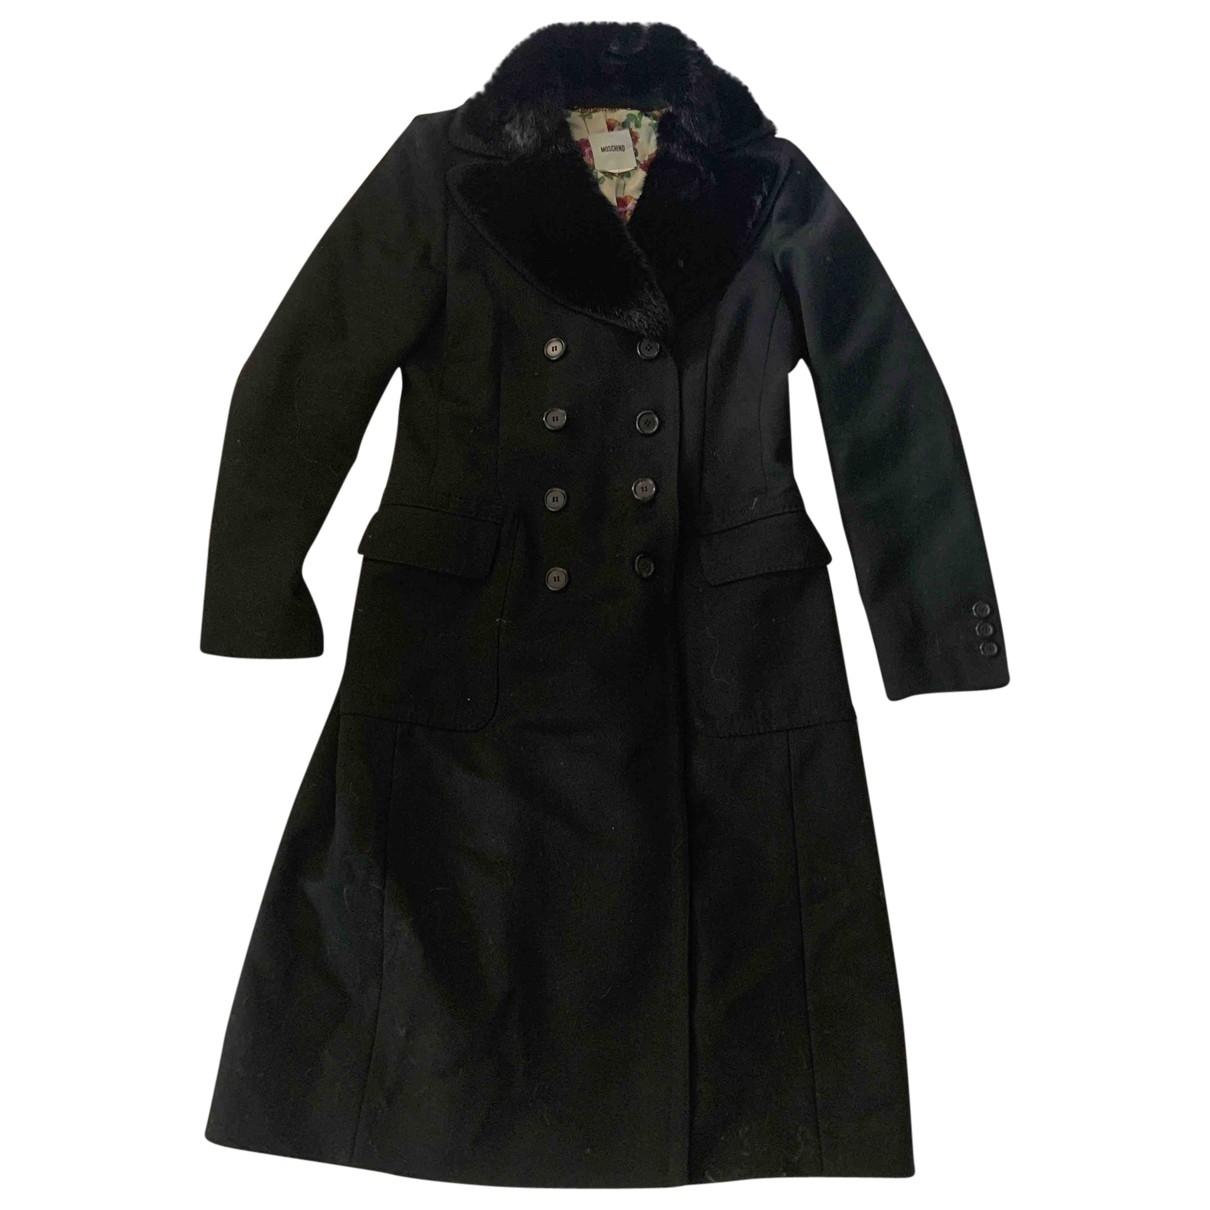 Moschino \N Black Wool coat for Women 10 UK